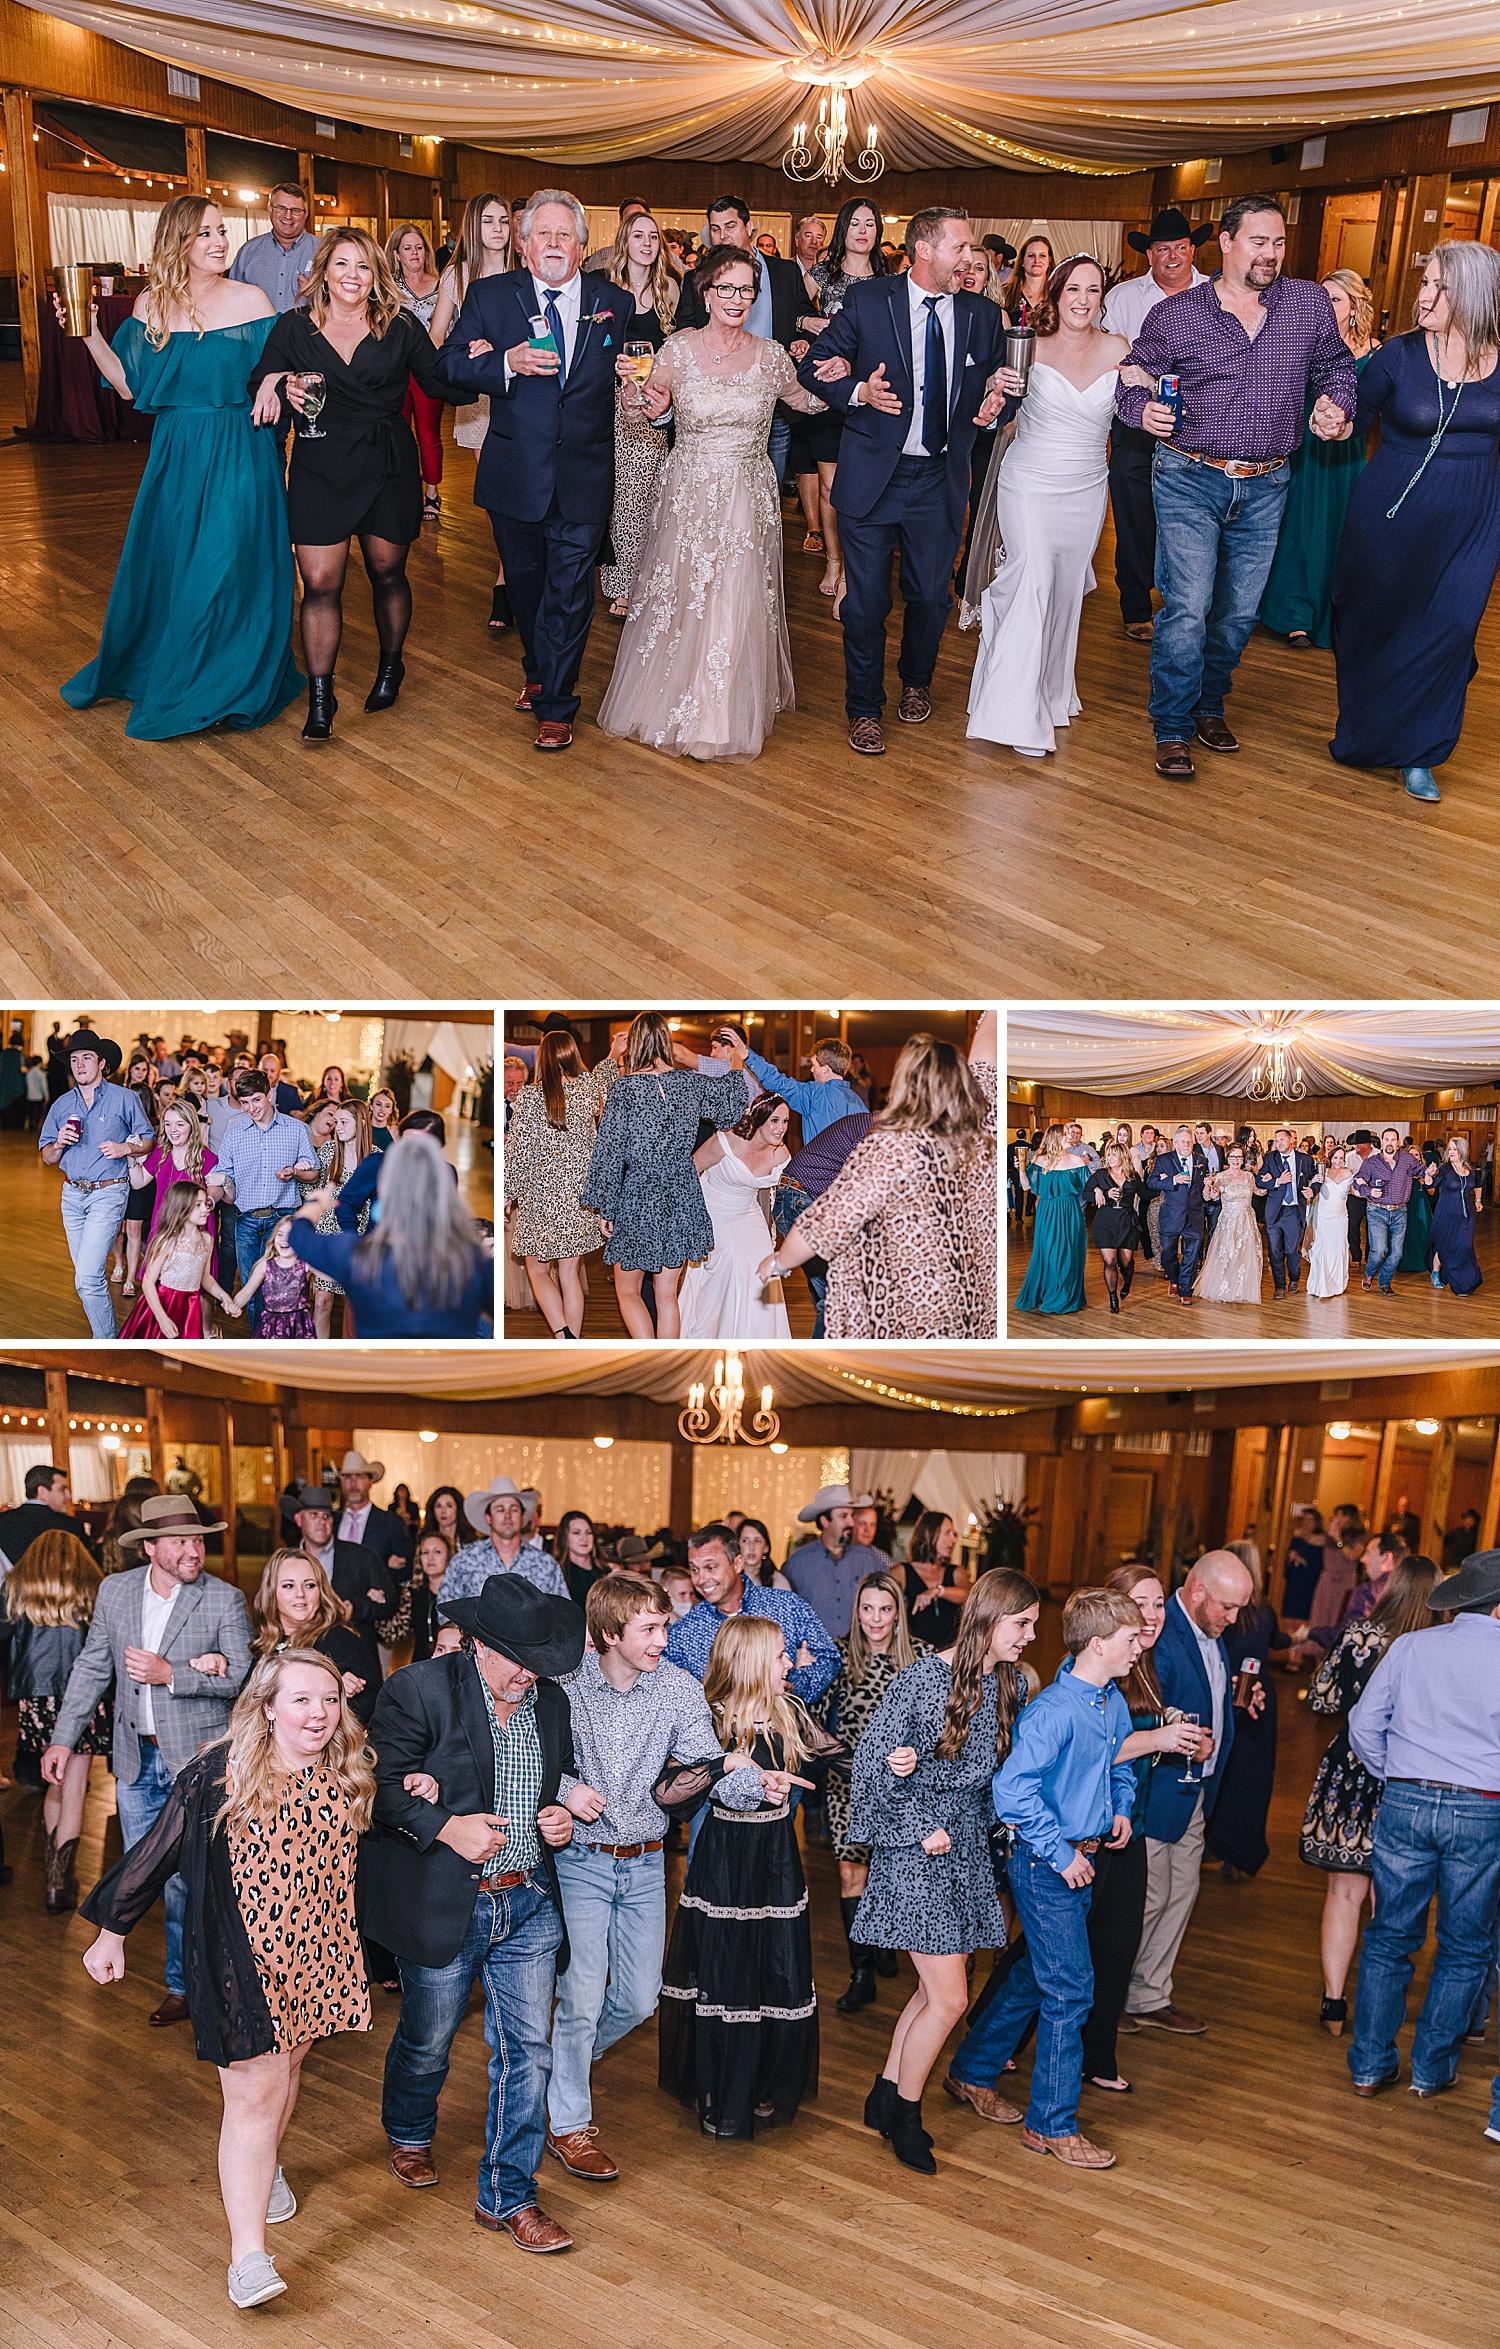 Jewel-Tone-Texas-Wedding-Valerie-Jason-Carly-Barton-Photography_0093.jpg